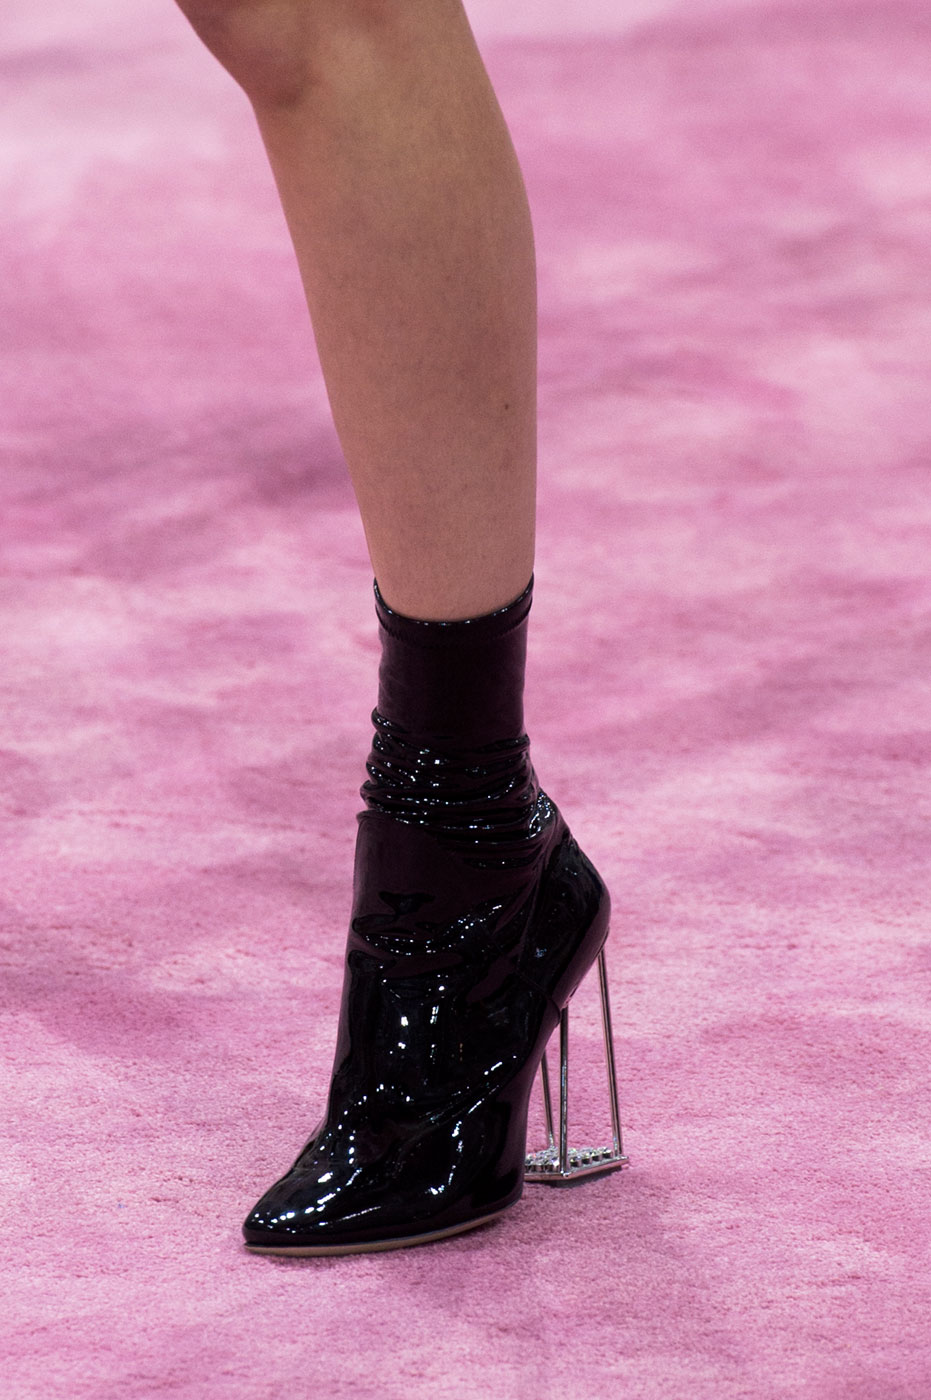 Christian-Dior-fashion-runway-show-close-ups-haute-couture-paris-spring-summer-2015-the-impression-202